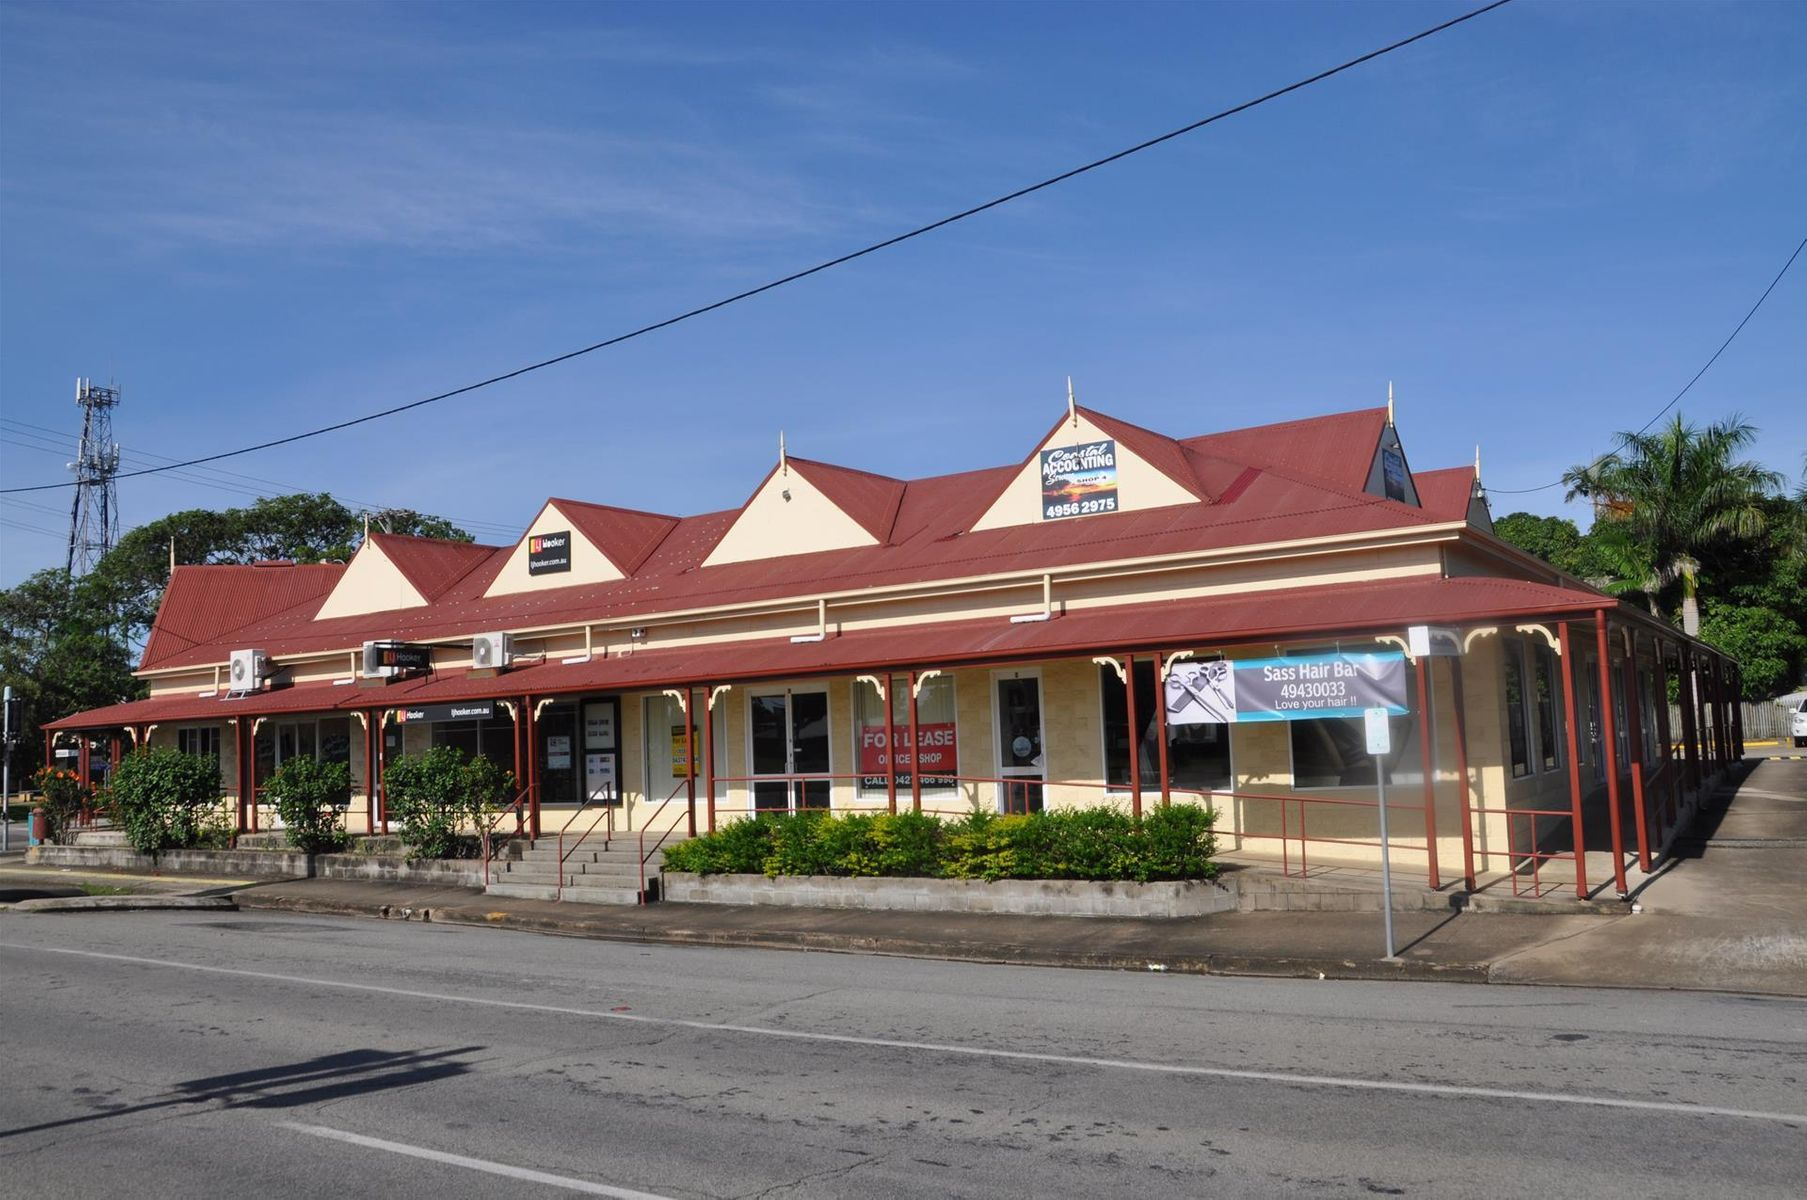 1/71 Broad Street, Sarina, QLD 4737